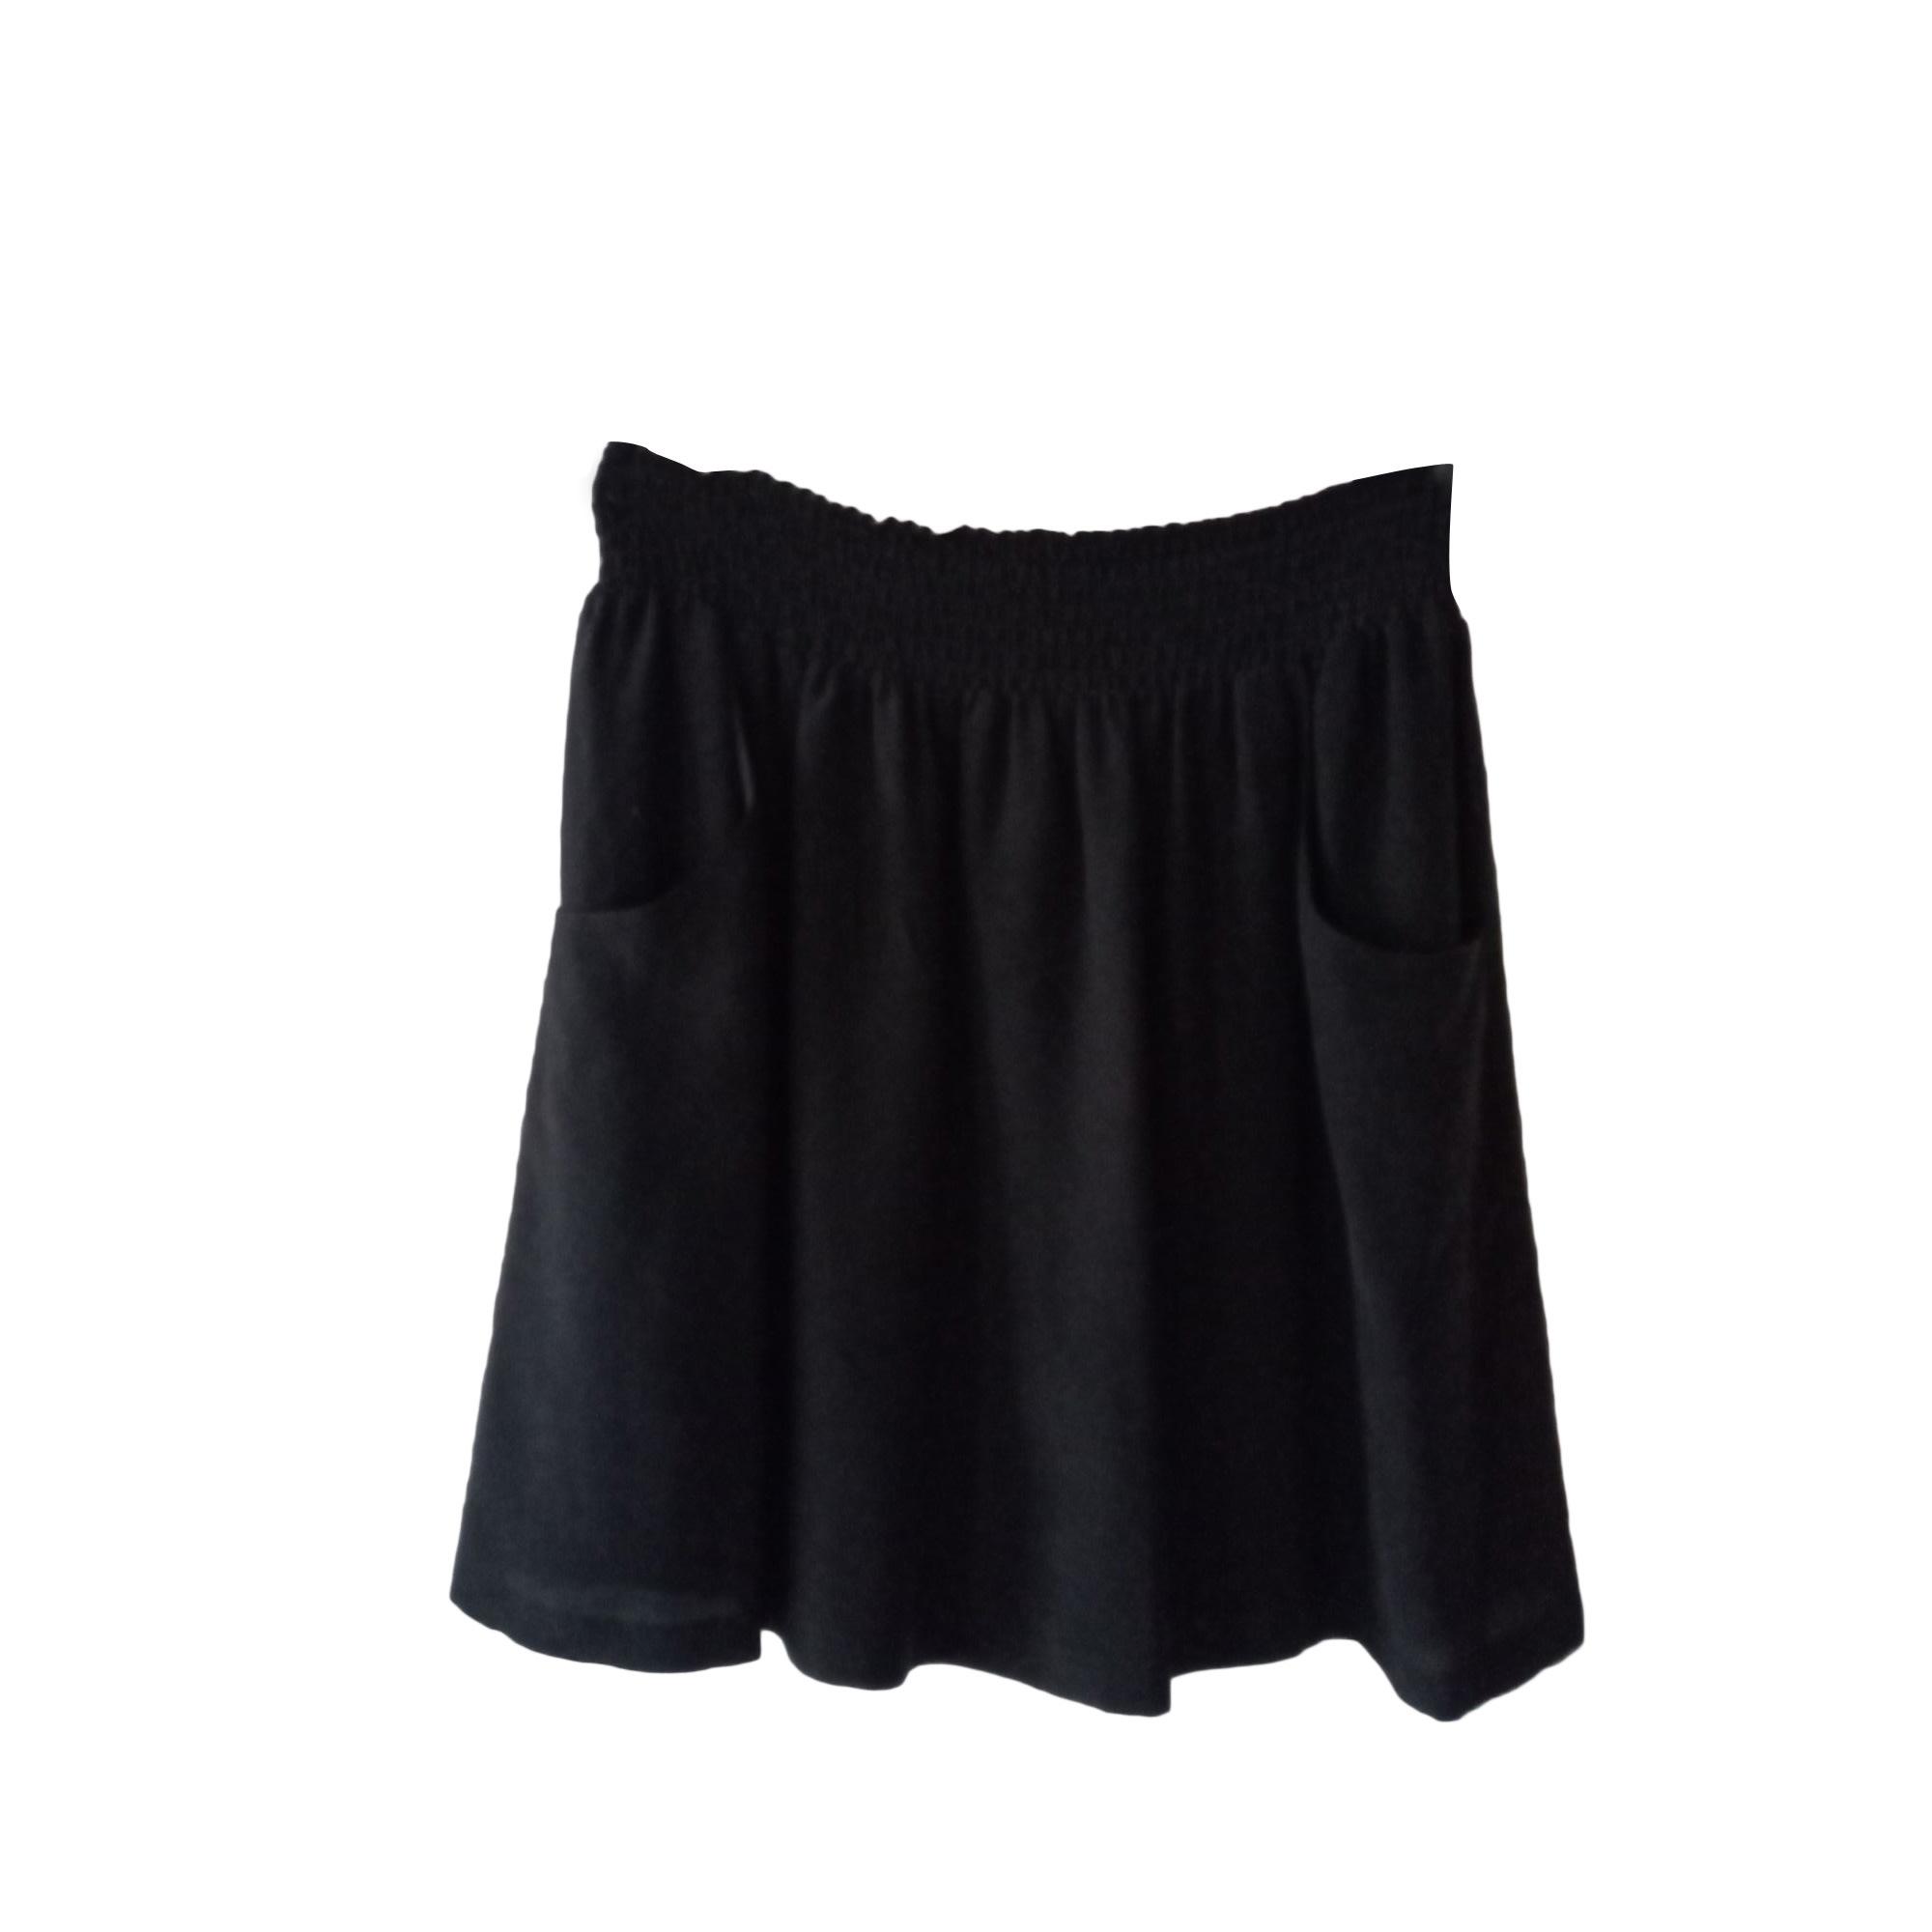 Jupe courte BEL AIR Noir